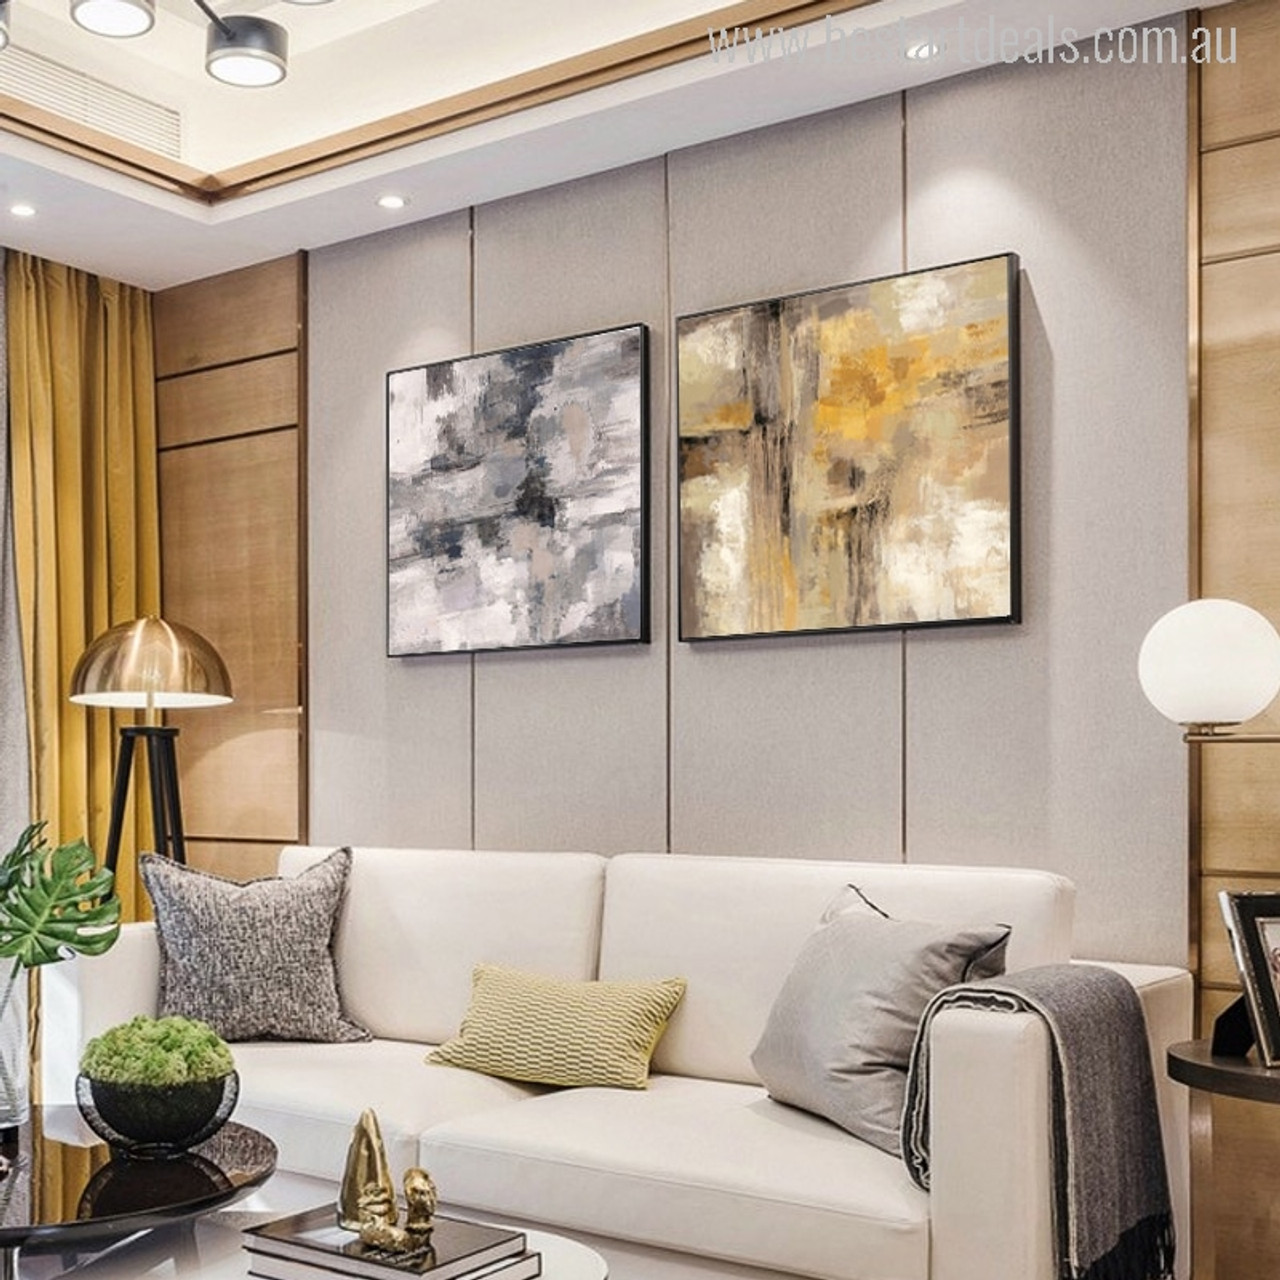 Buy Yellow Gray Oil Painting Canvas Print Wall Art Decor